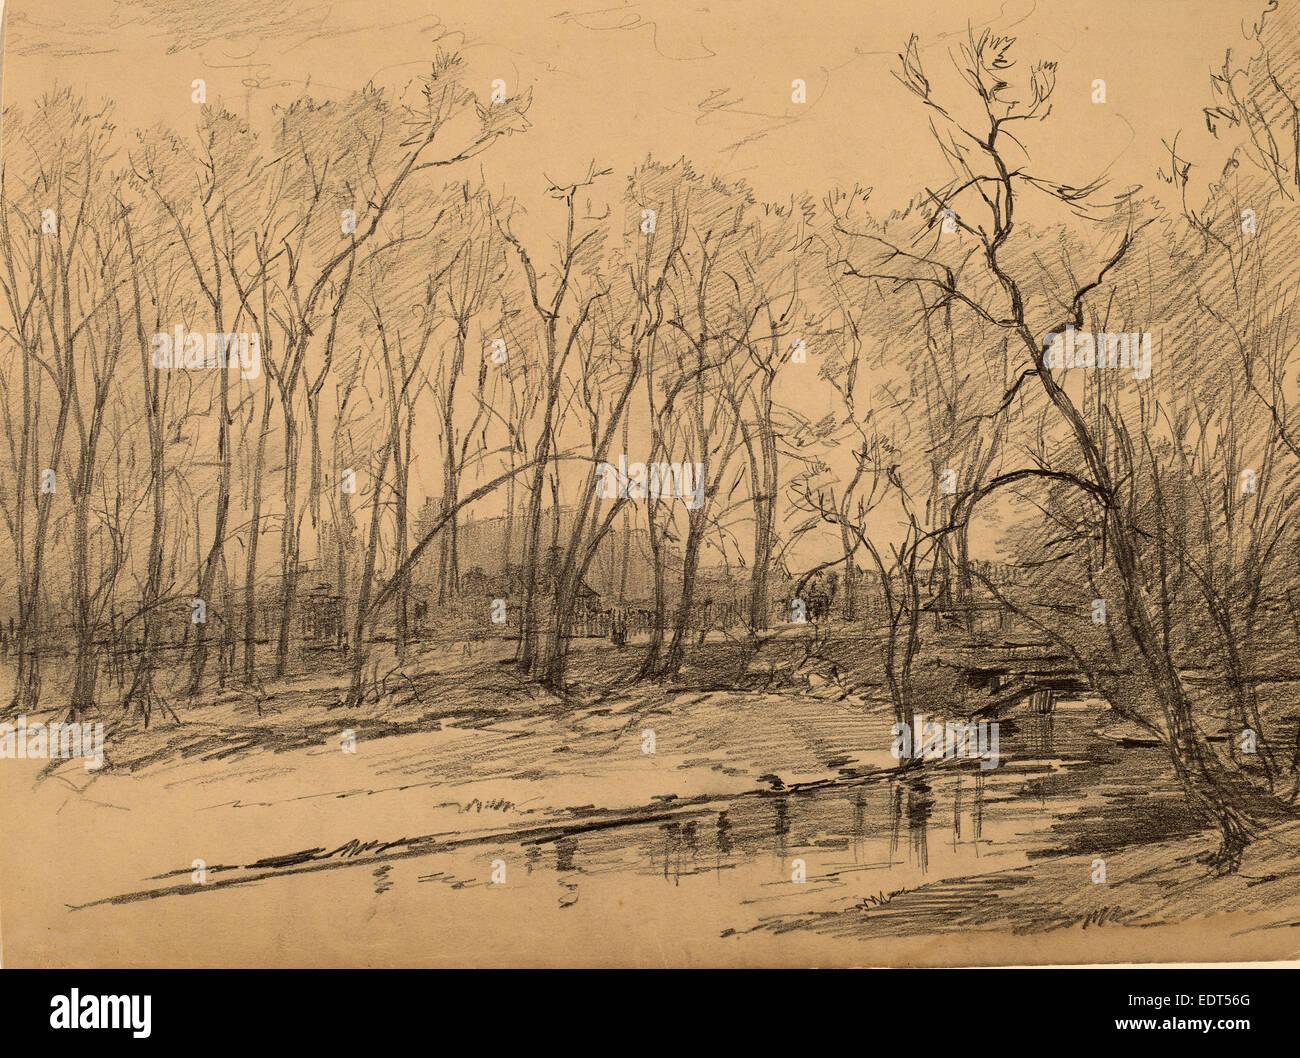 Walter Shirlaw, Munich Factory, American, 1838 - 1909, graphite - Stock Image